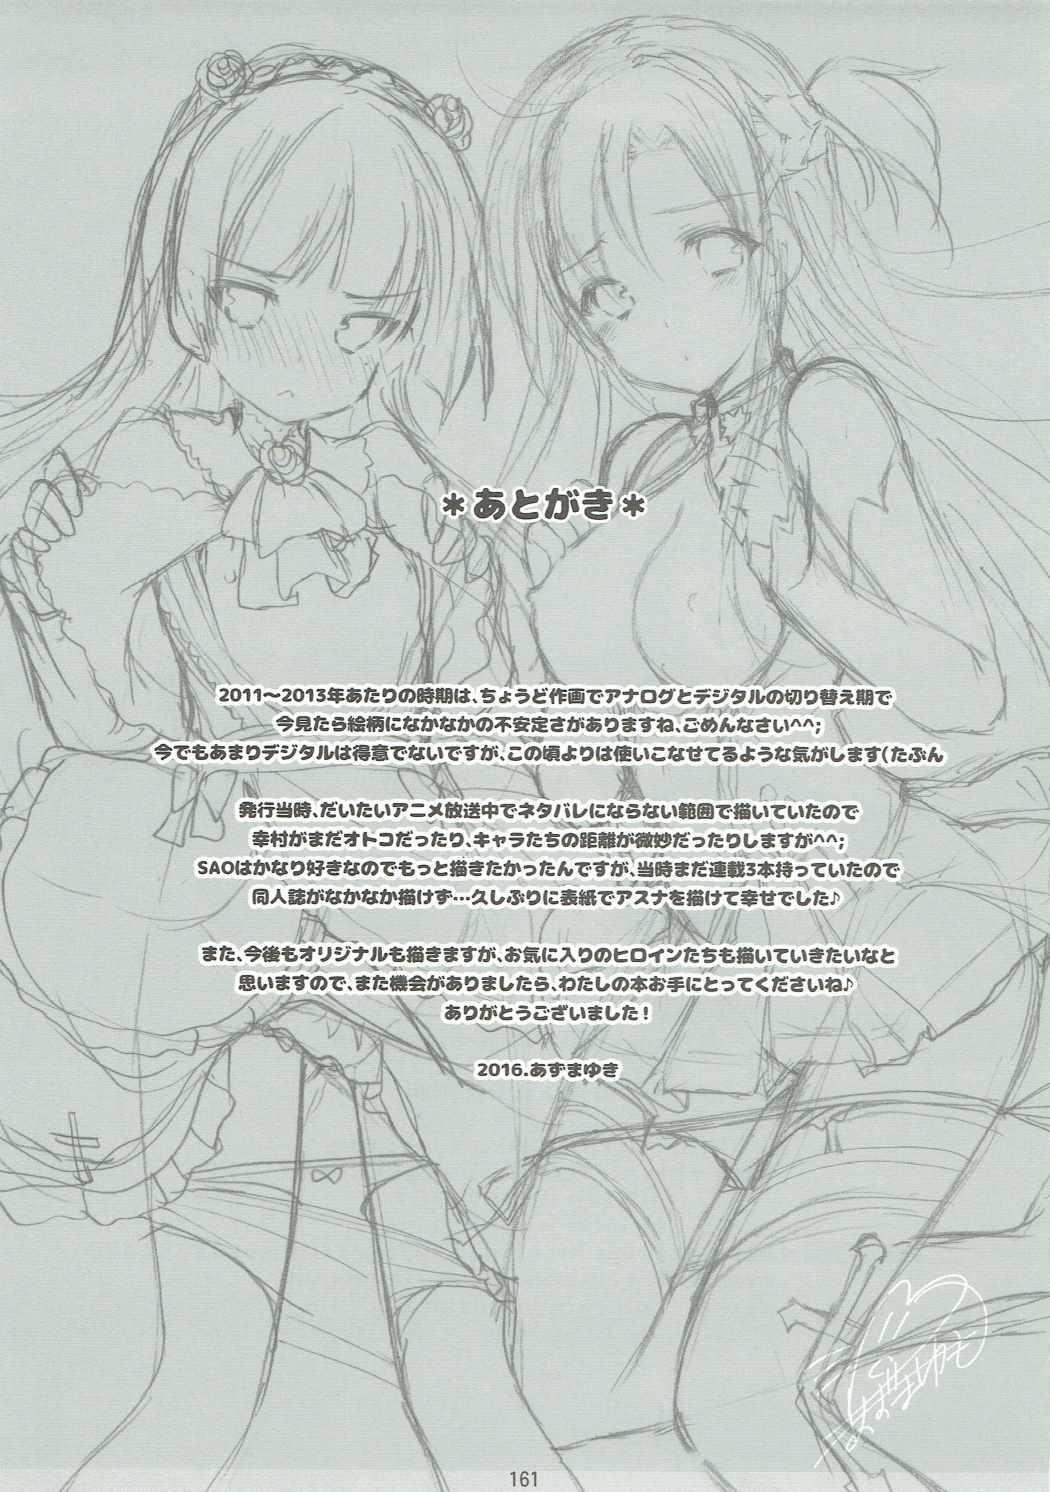 ANIME COLLECTION Imomuya Honpo - Singleton Anime Soushuuhen 159